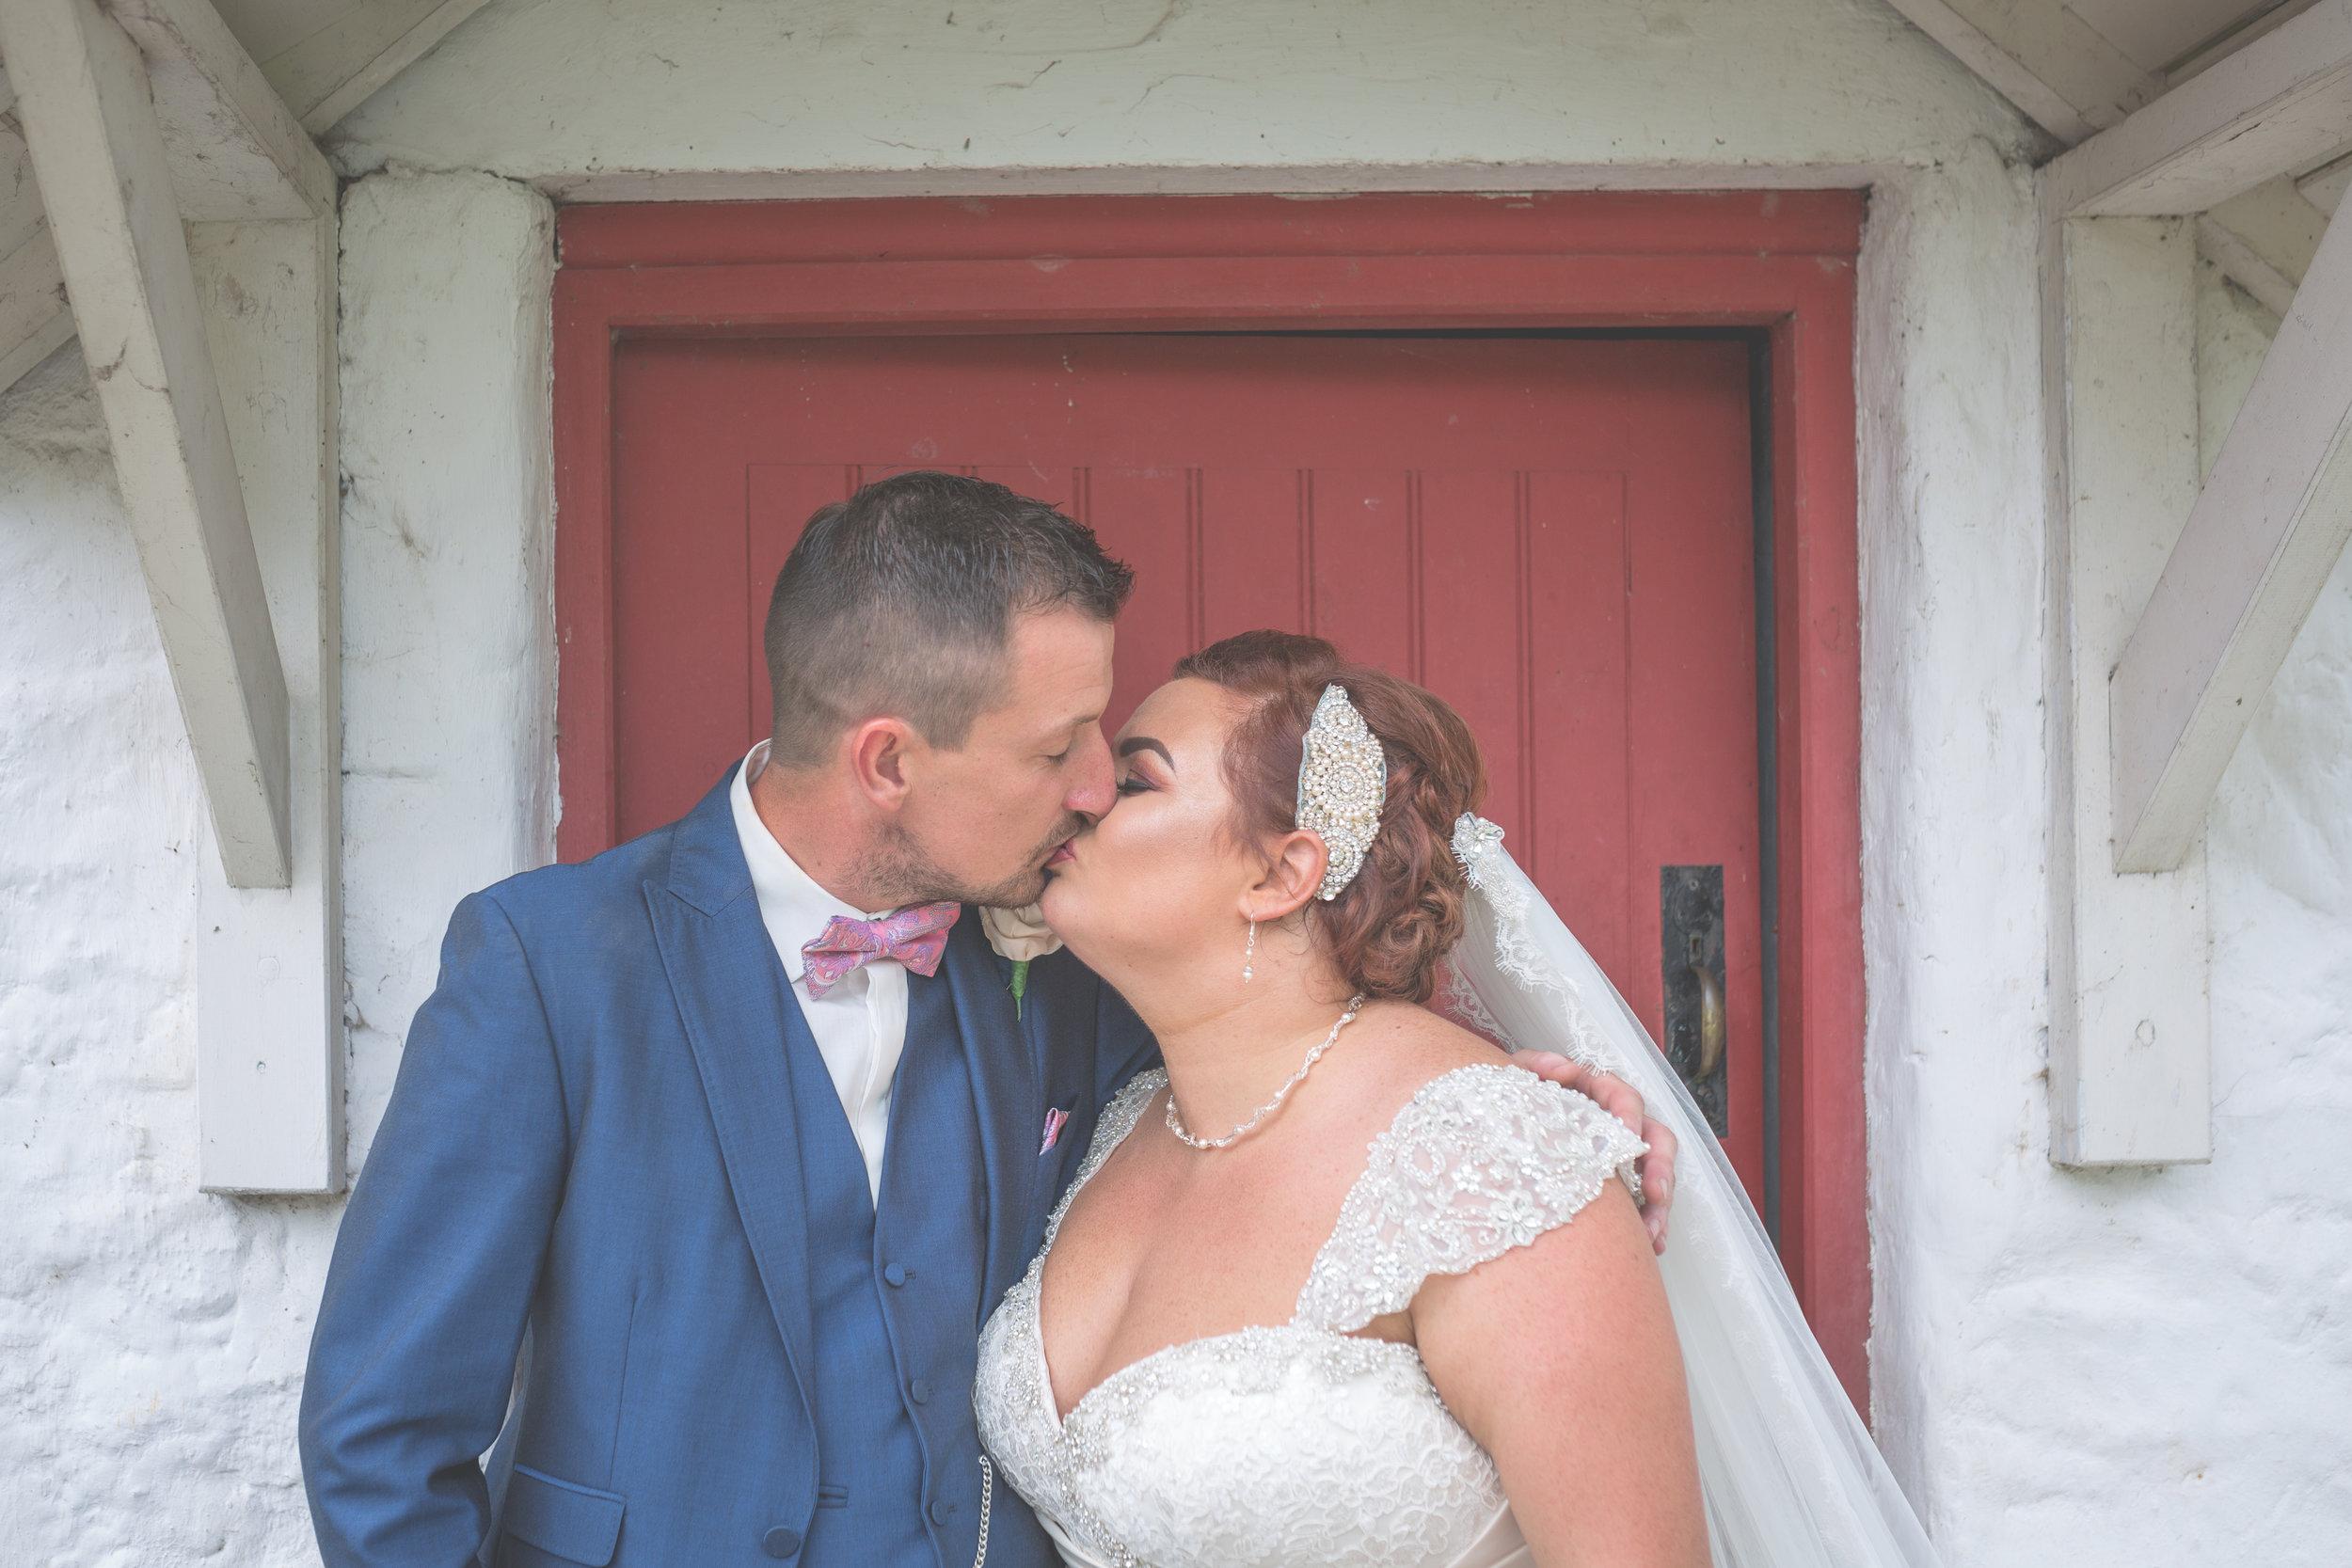 Antoinette & Stephen - Portraits   Brian McEwan Photography   Wedding Photographer Northern Ireland 7.jpg